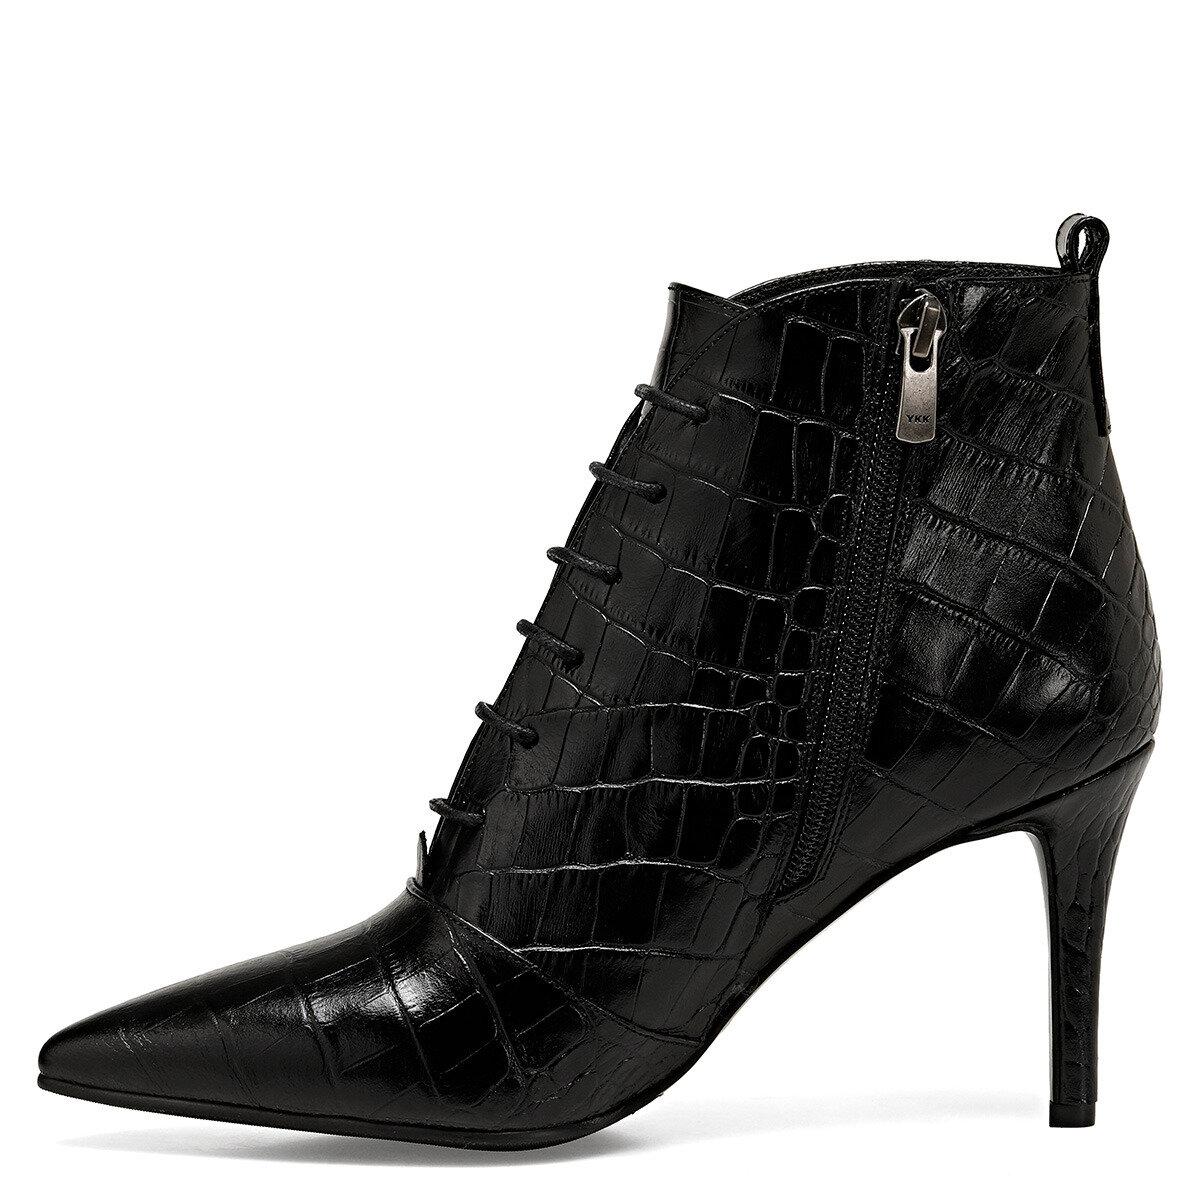 SHEILA Siyah Kadın Topuklu Ayakkabı